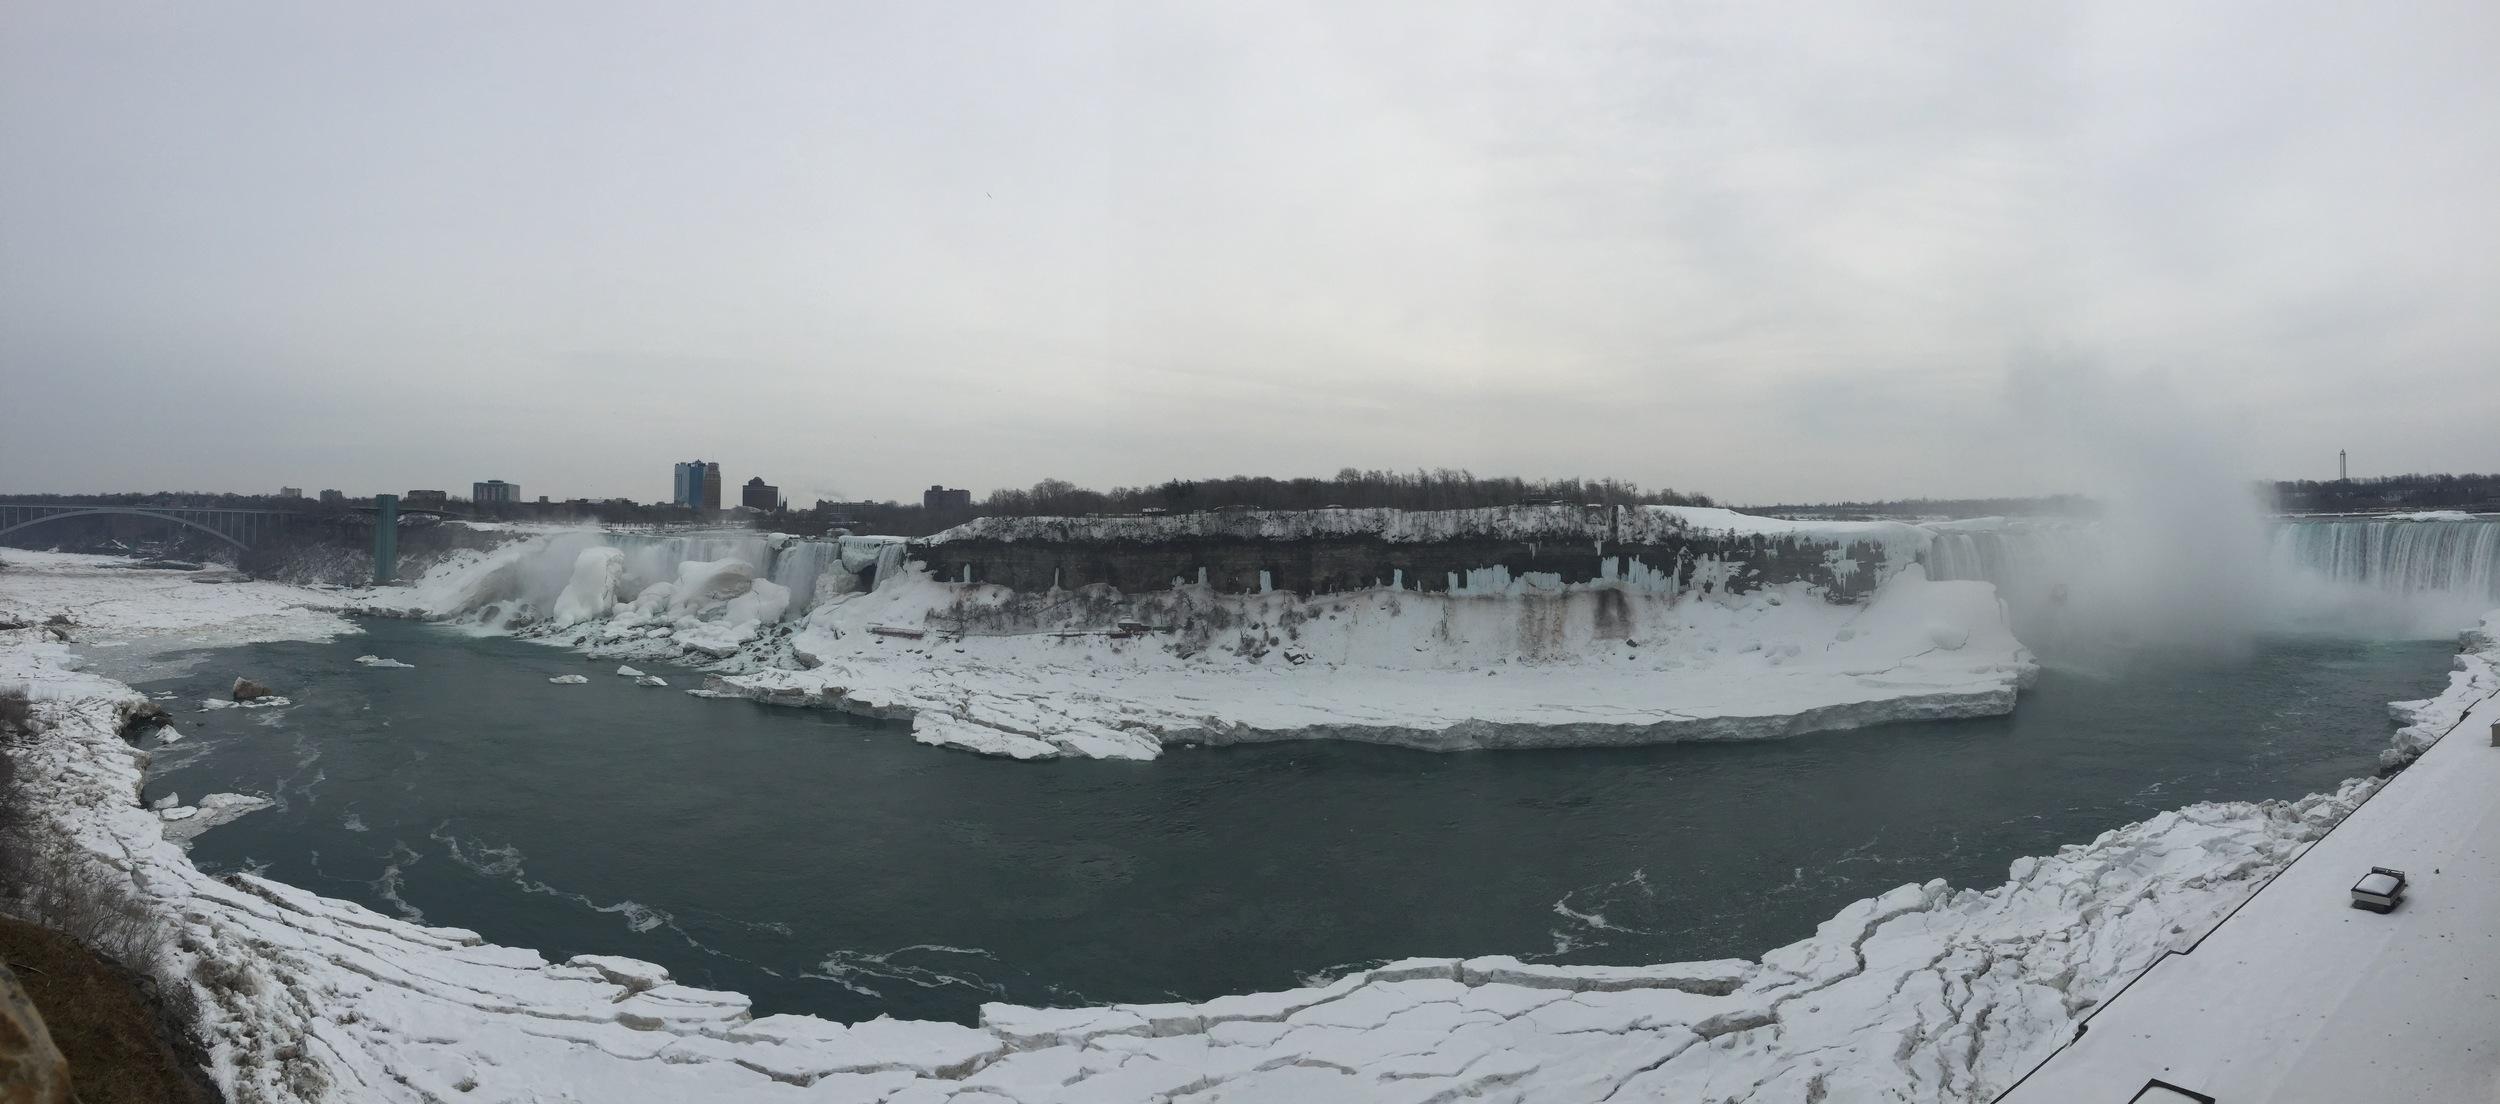 Frozen Niagara Falls - US and Canadian Sides